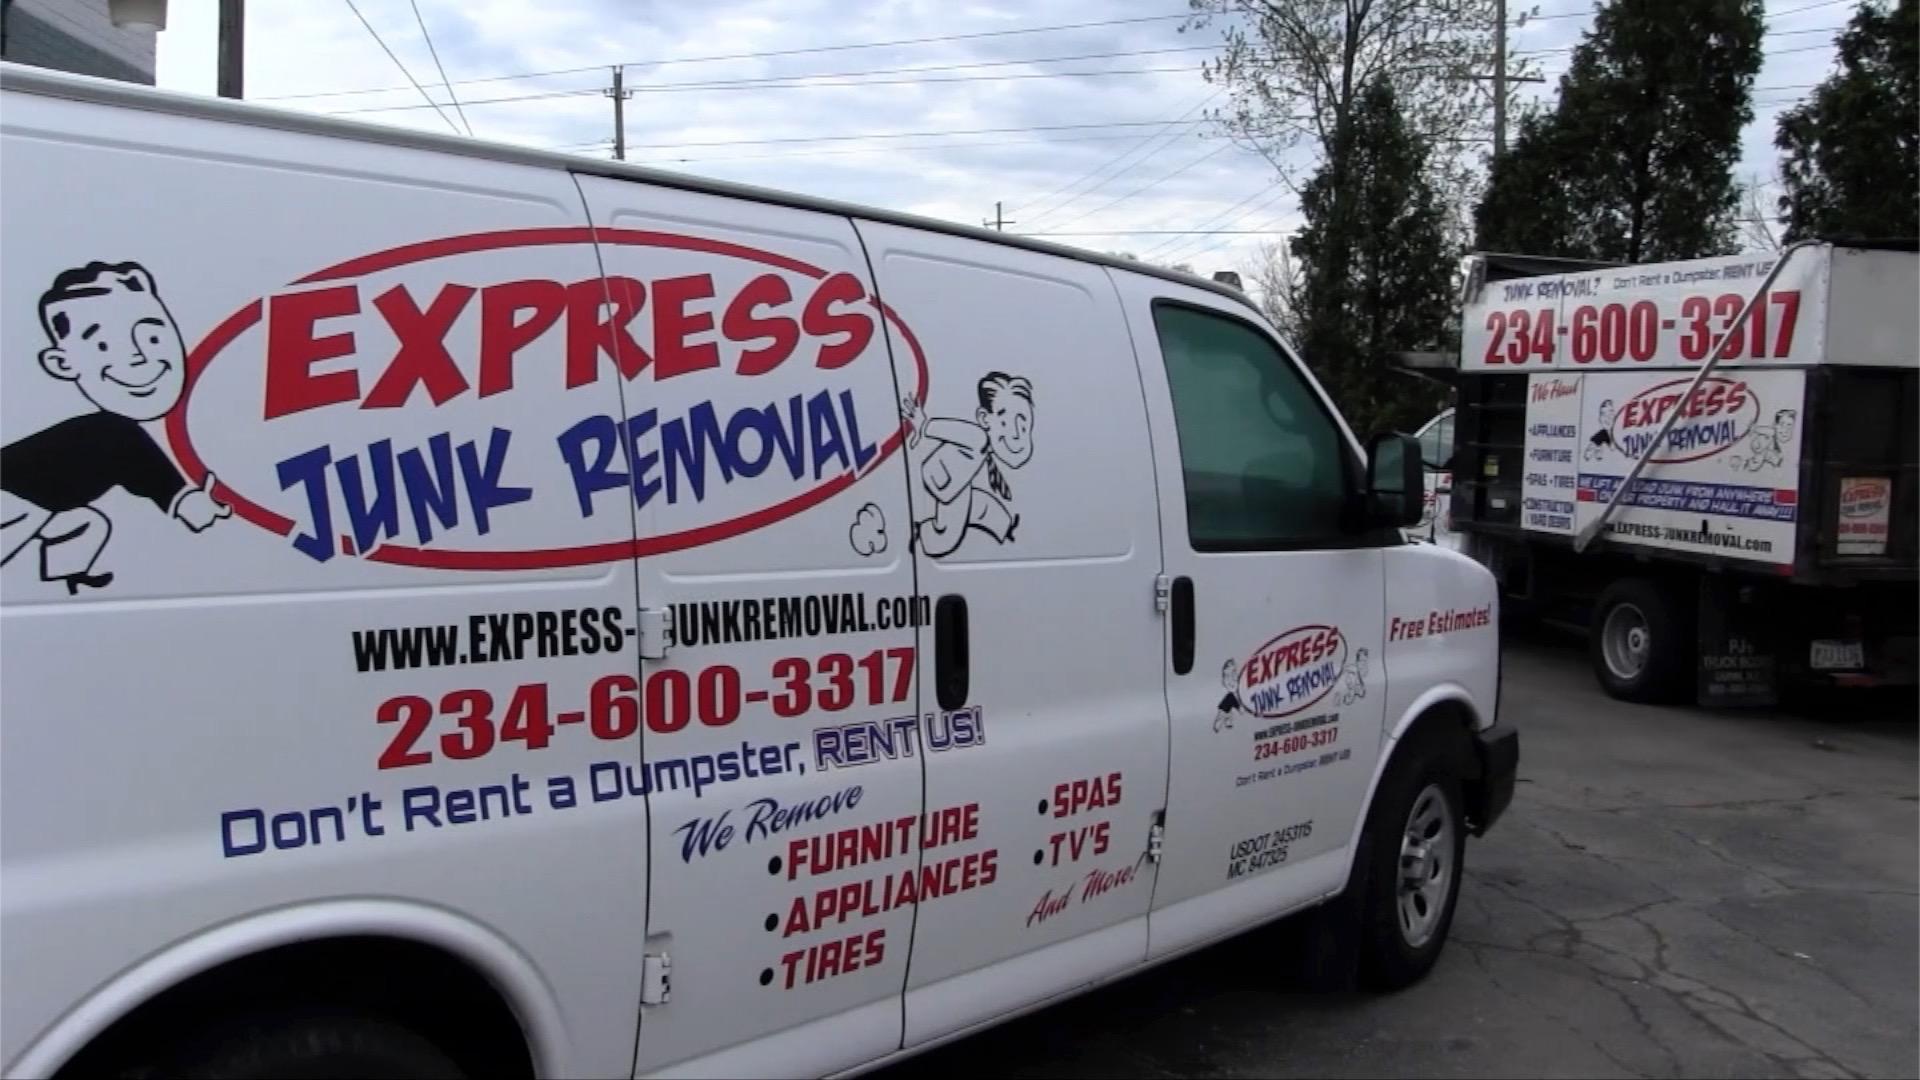 Burgan Real Estate & Express Junk Removal